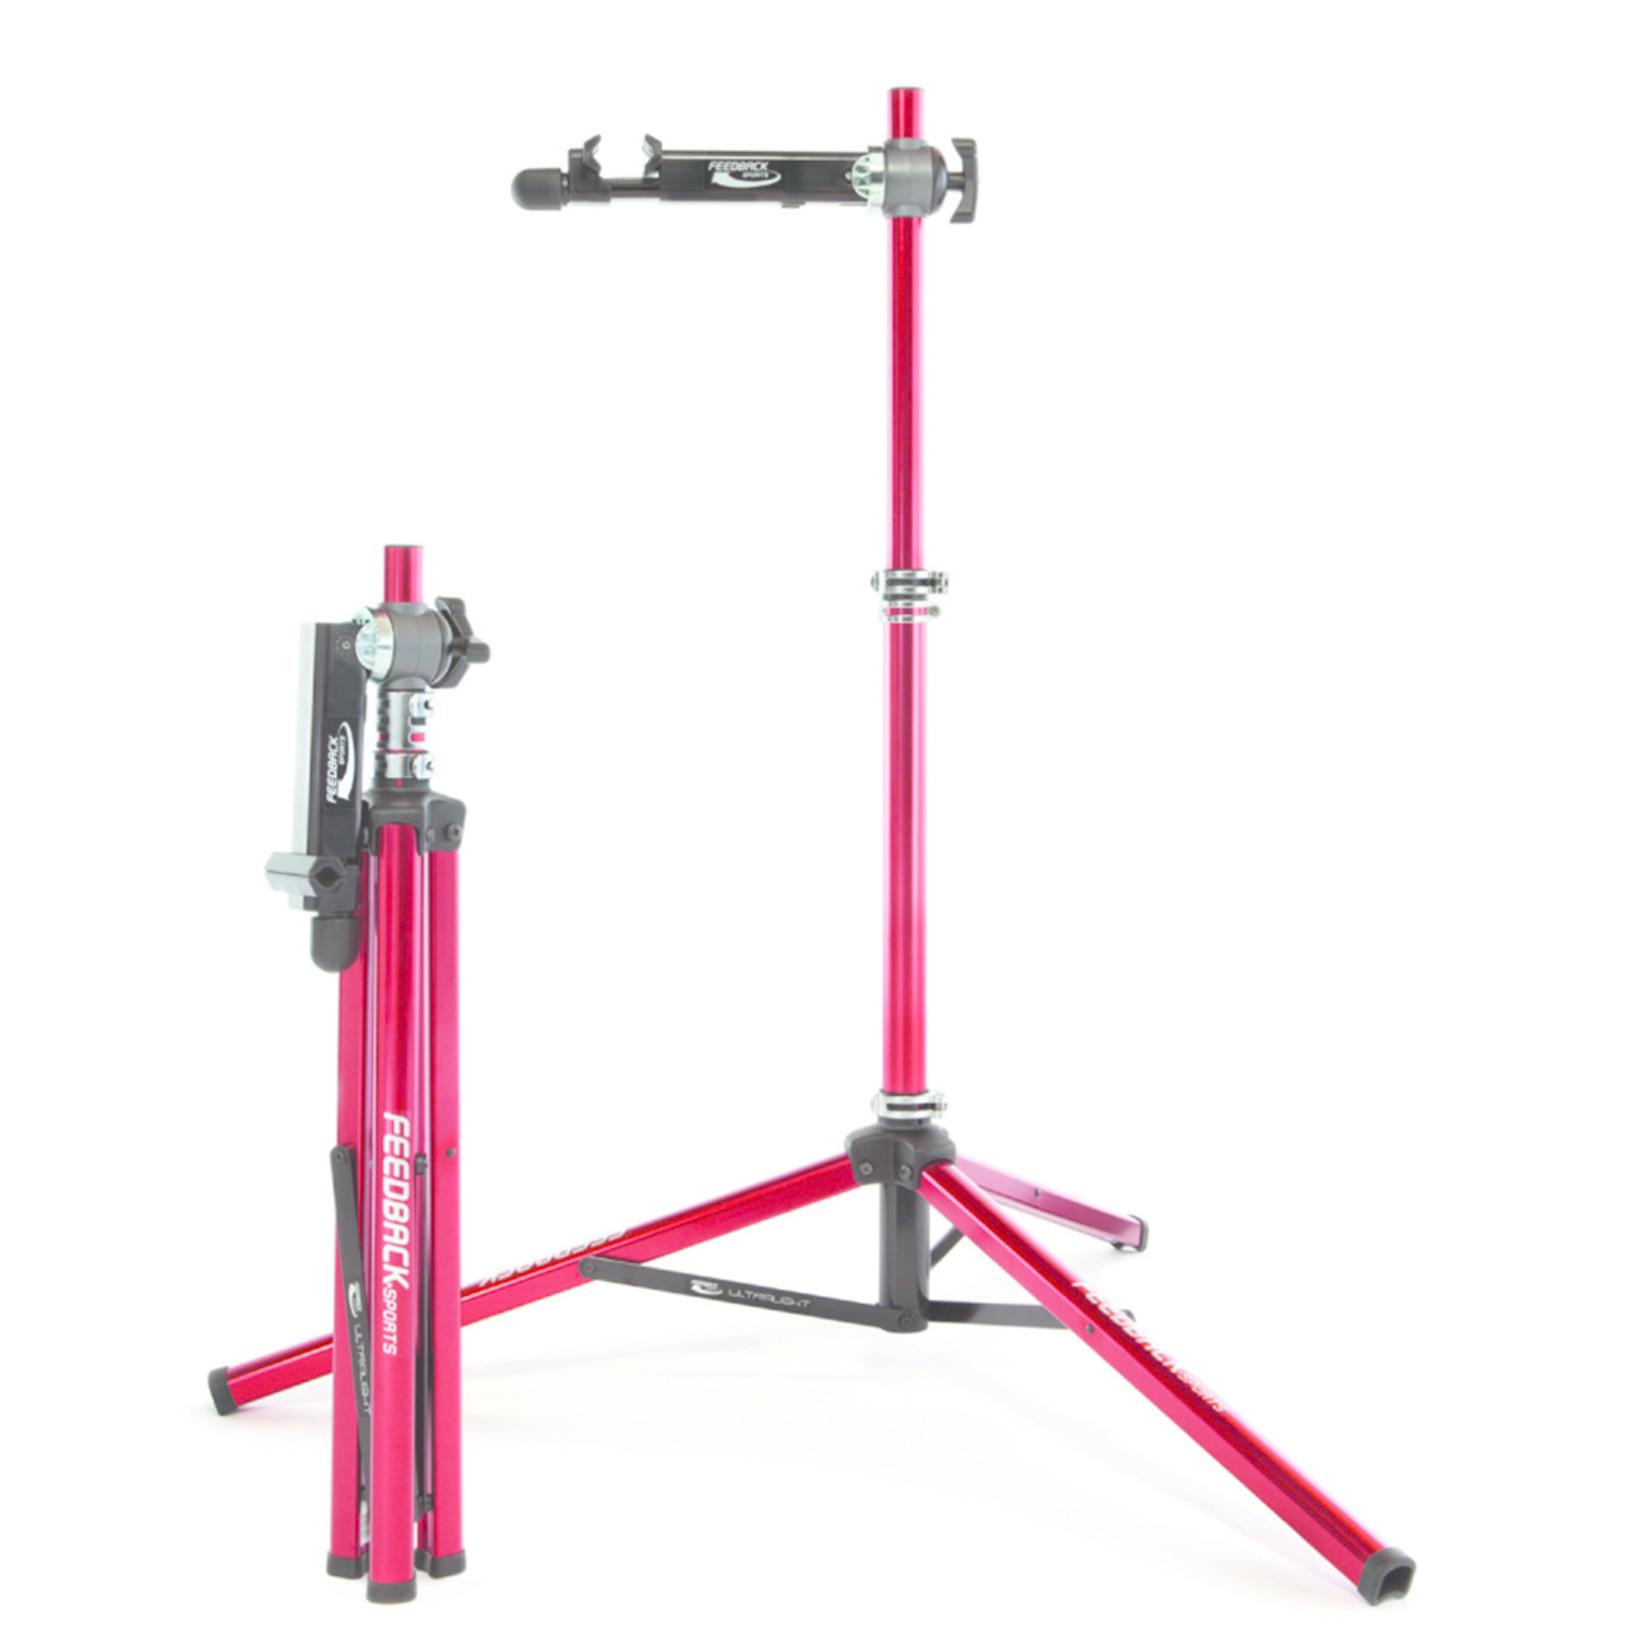 LTP Feedback Pro Ultra-Light Repair Stand